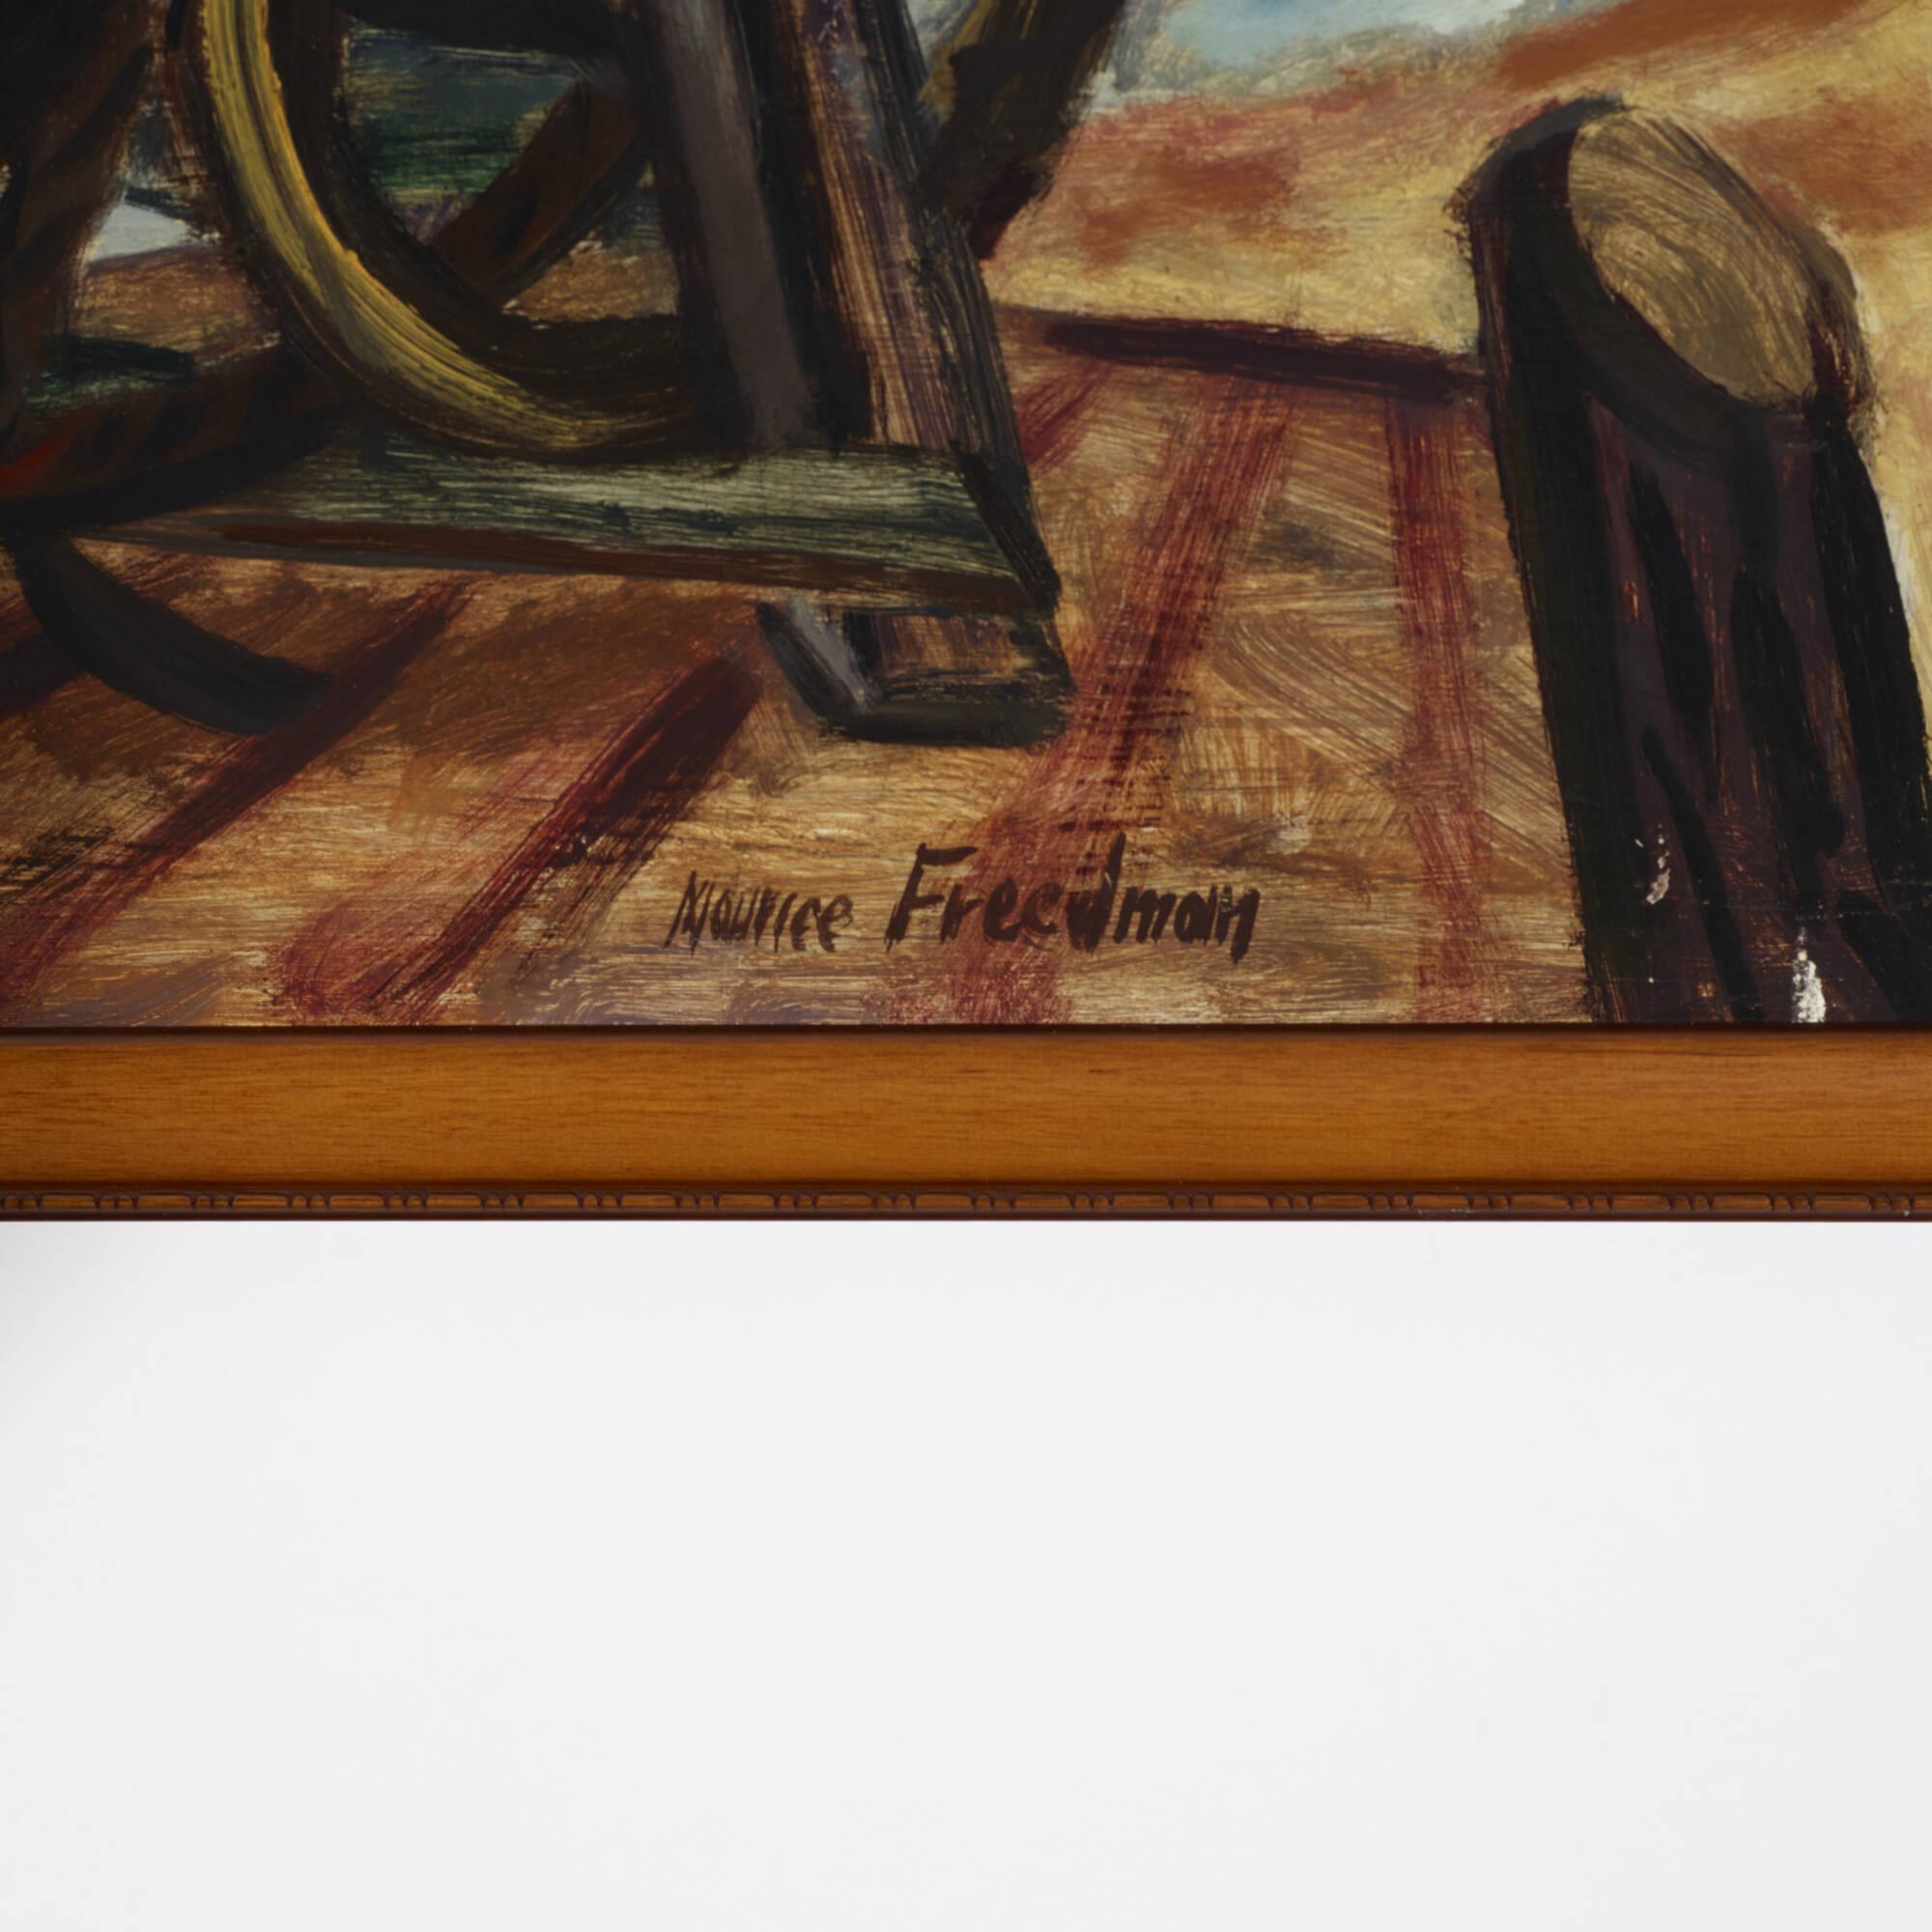 202: Maurice Freedman / Untitled (Harbor) (2 of 2)